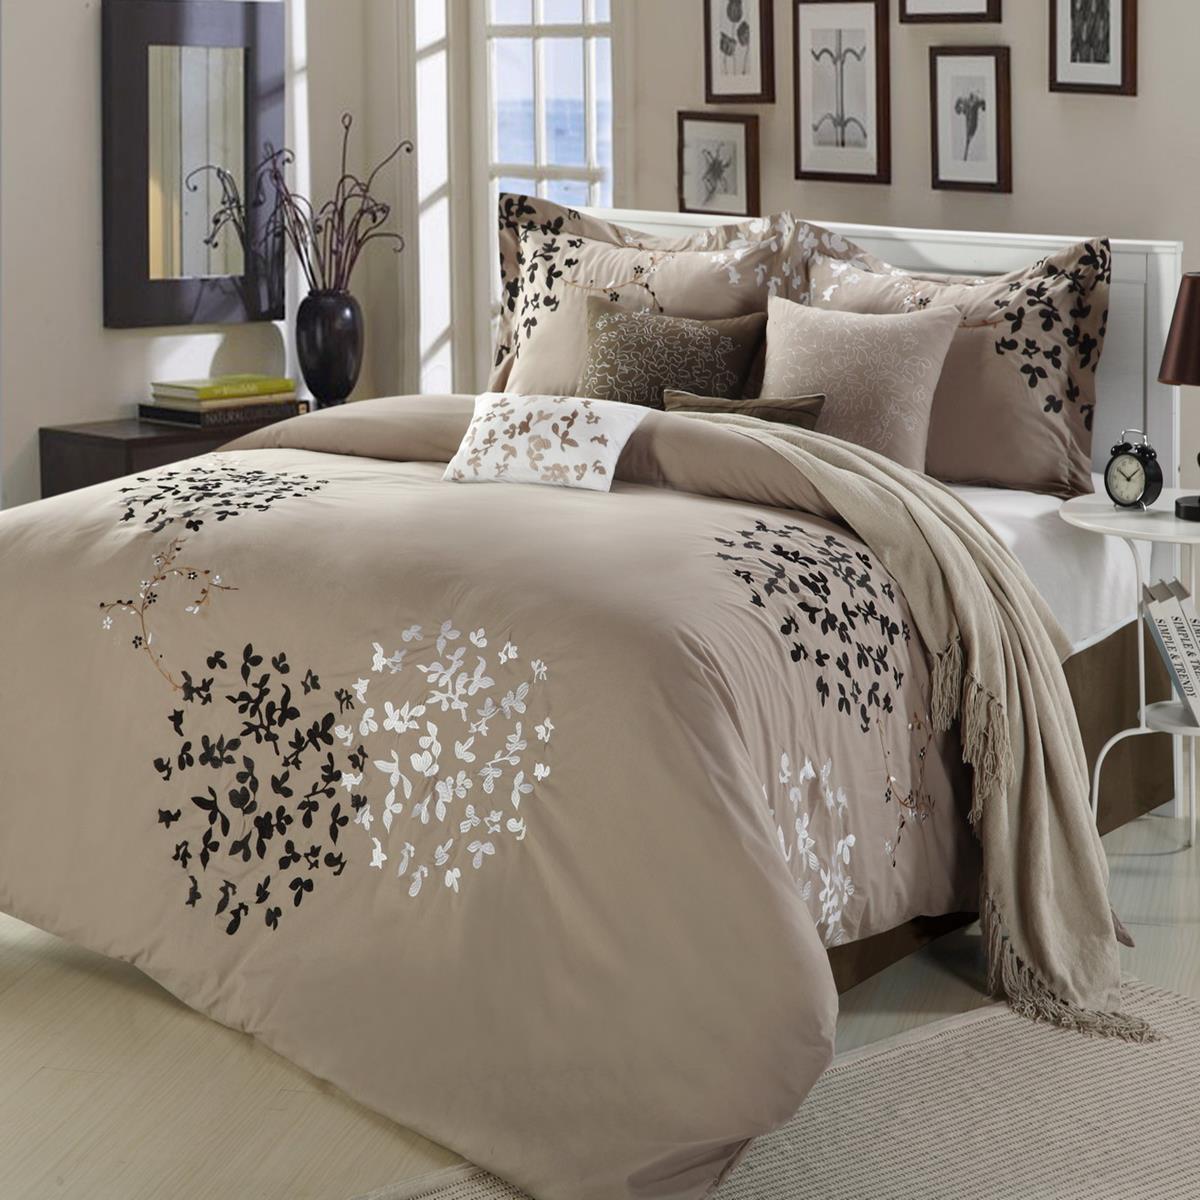 cheila beige silver brown 8 piece king comforter bed in a bag set new ebay. Black Bedroom Furniture Sets. Home Design Ideas